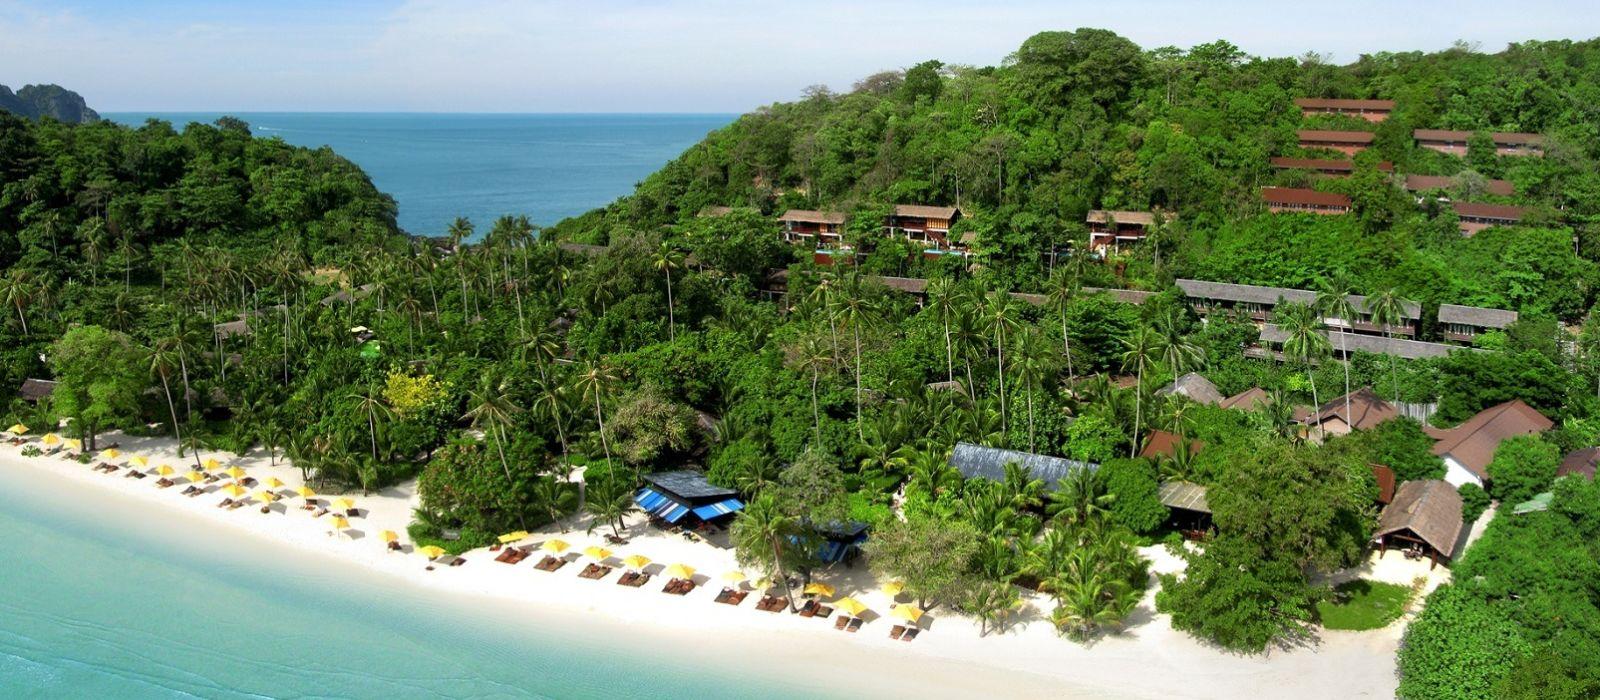 Hotel Zeavola Thailand